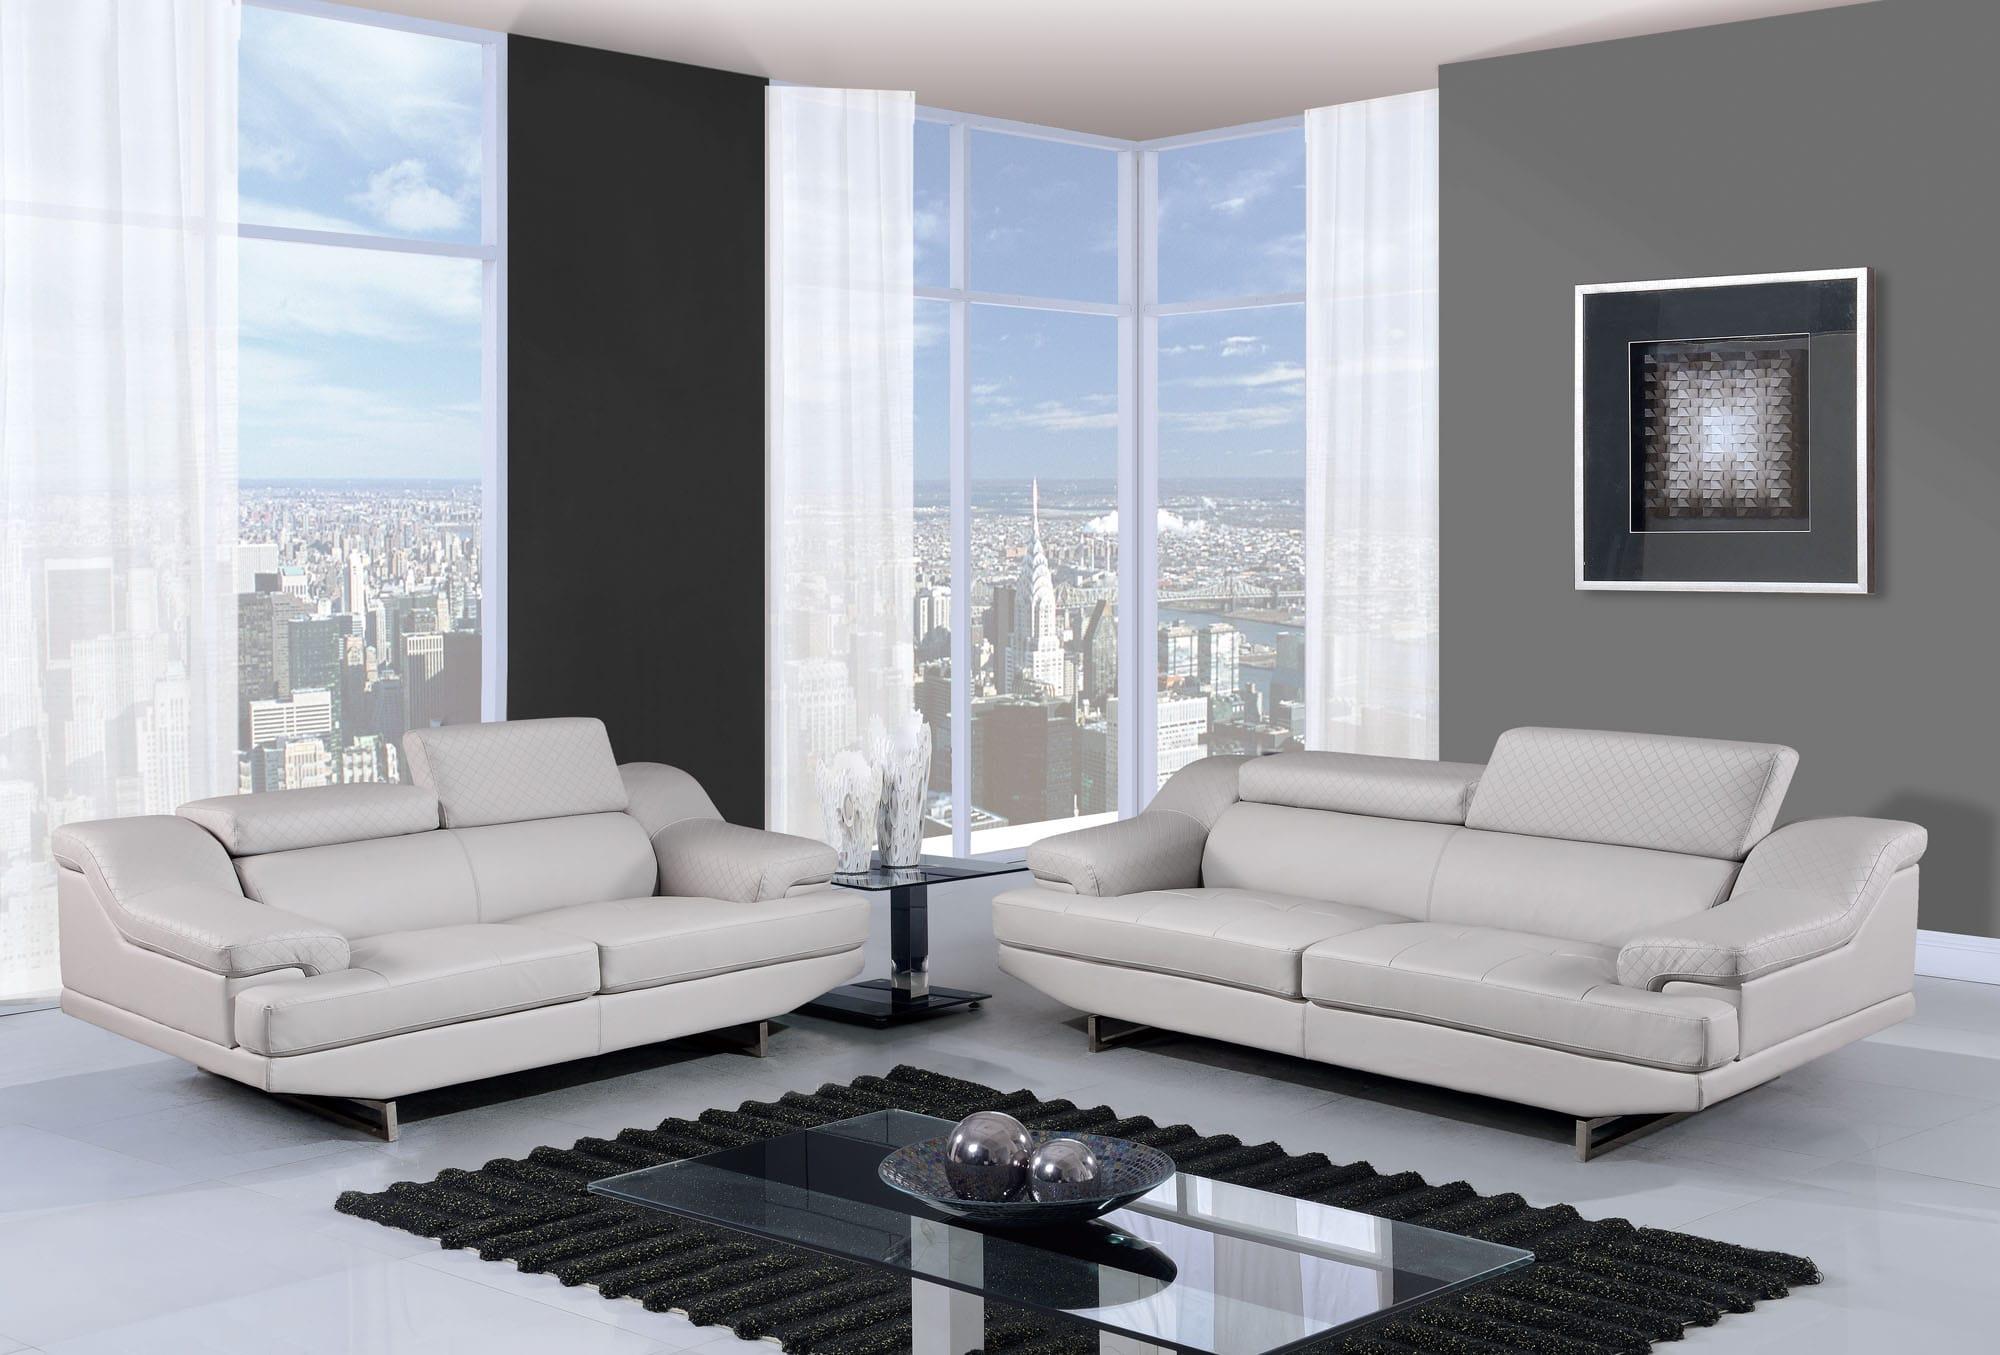 U8141 Light Grey Bonded Sofa by Global Furniture